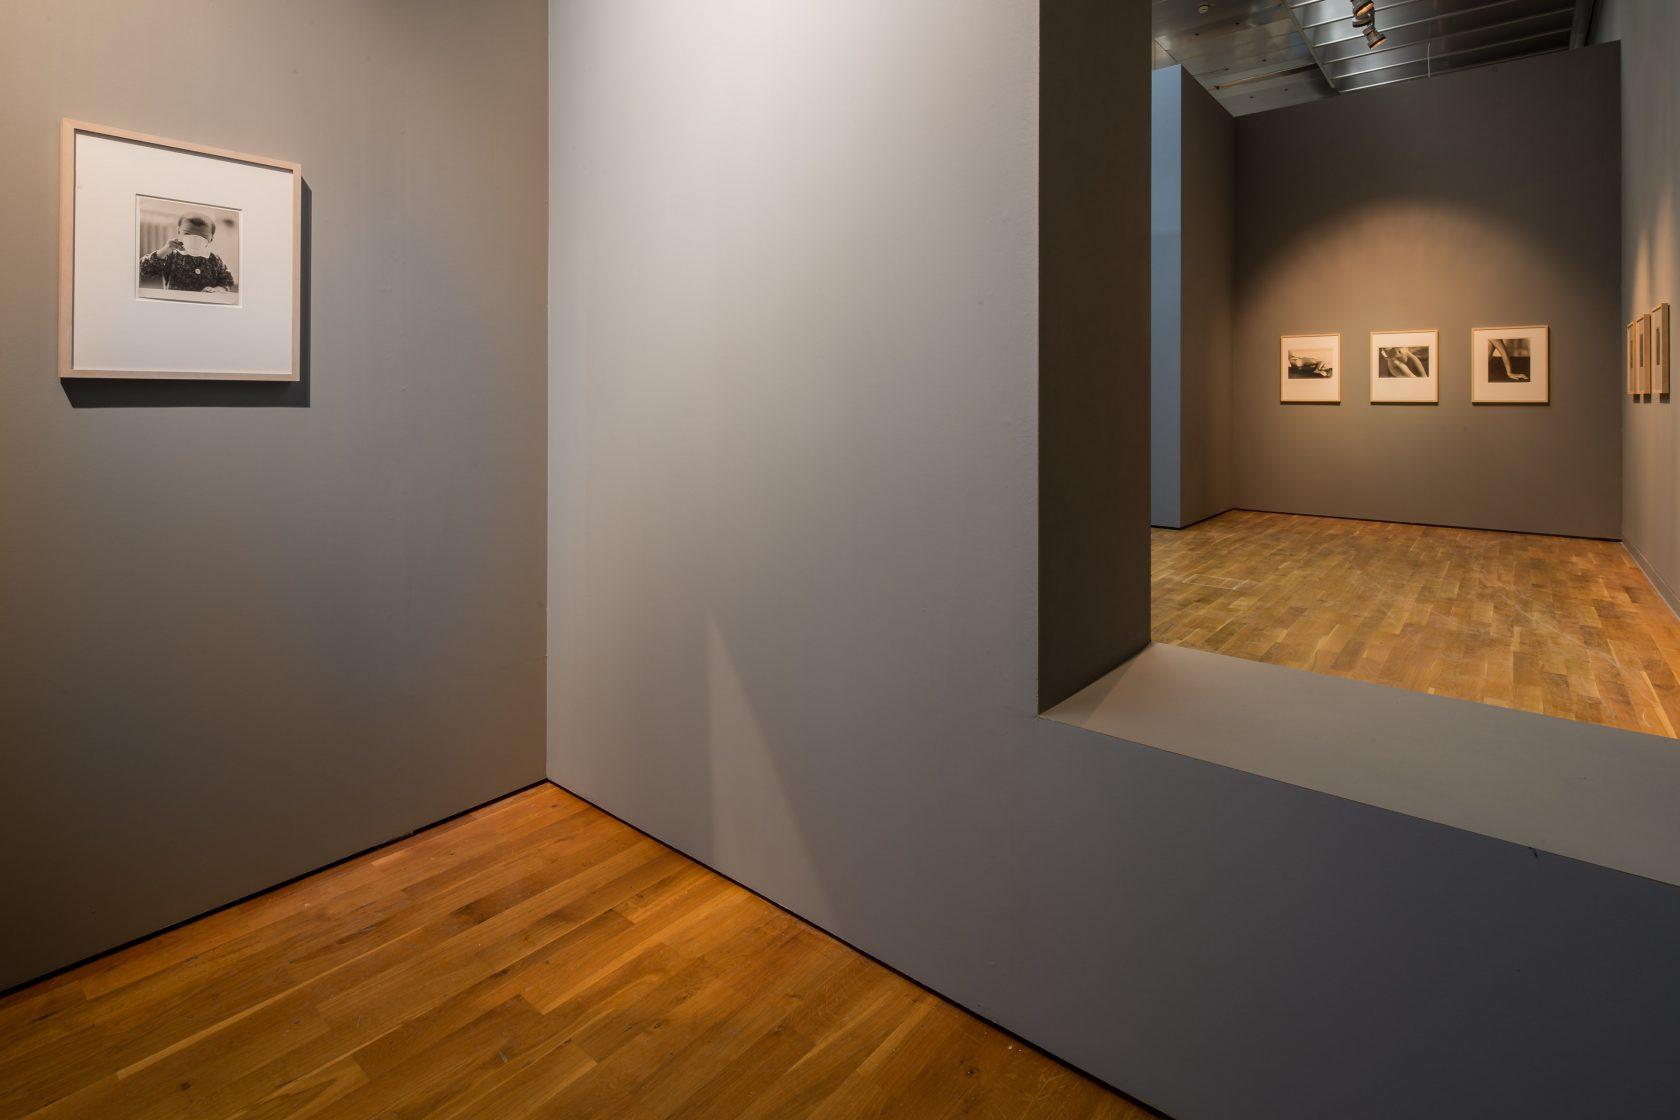 Blick in die Ausstellung »RealSurreal«, Kunstmuseum Wolfsburg, 15.11.2014 – 06.04.2015 Foto: Marek Kruszewski